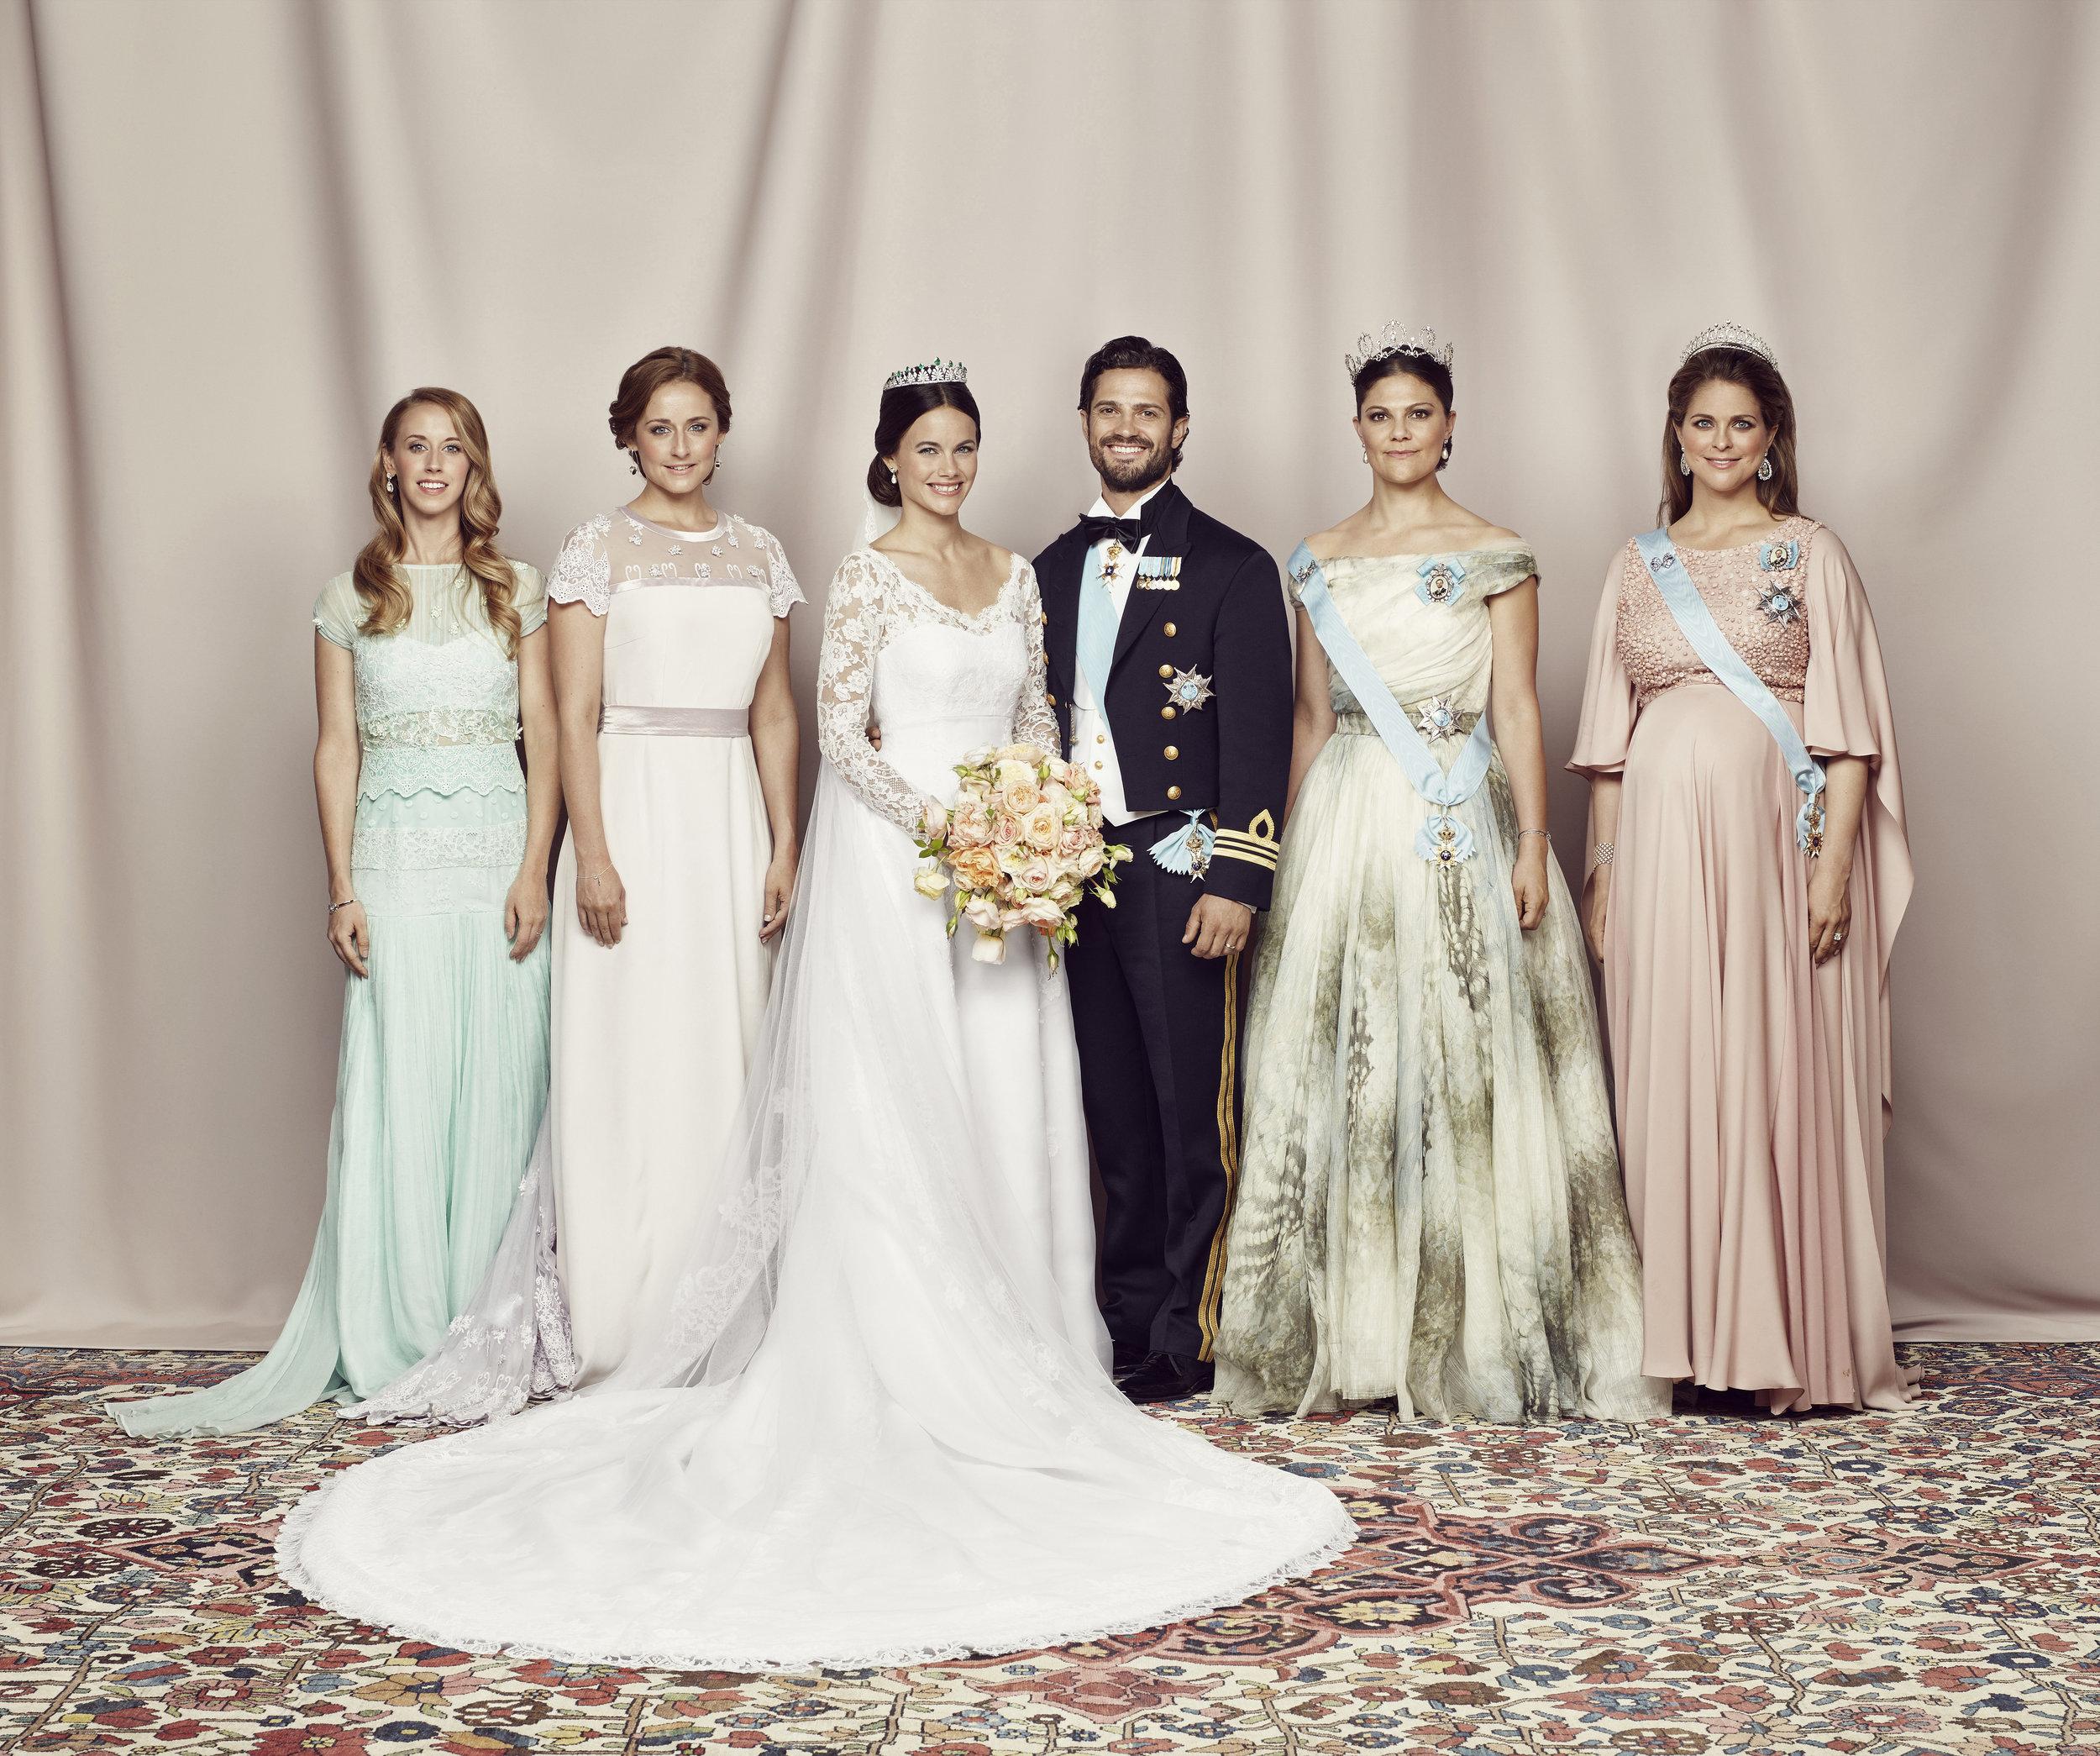 Photo: Mattias Edwall, The Royal Court, Sweden